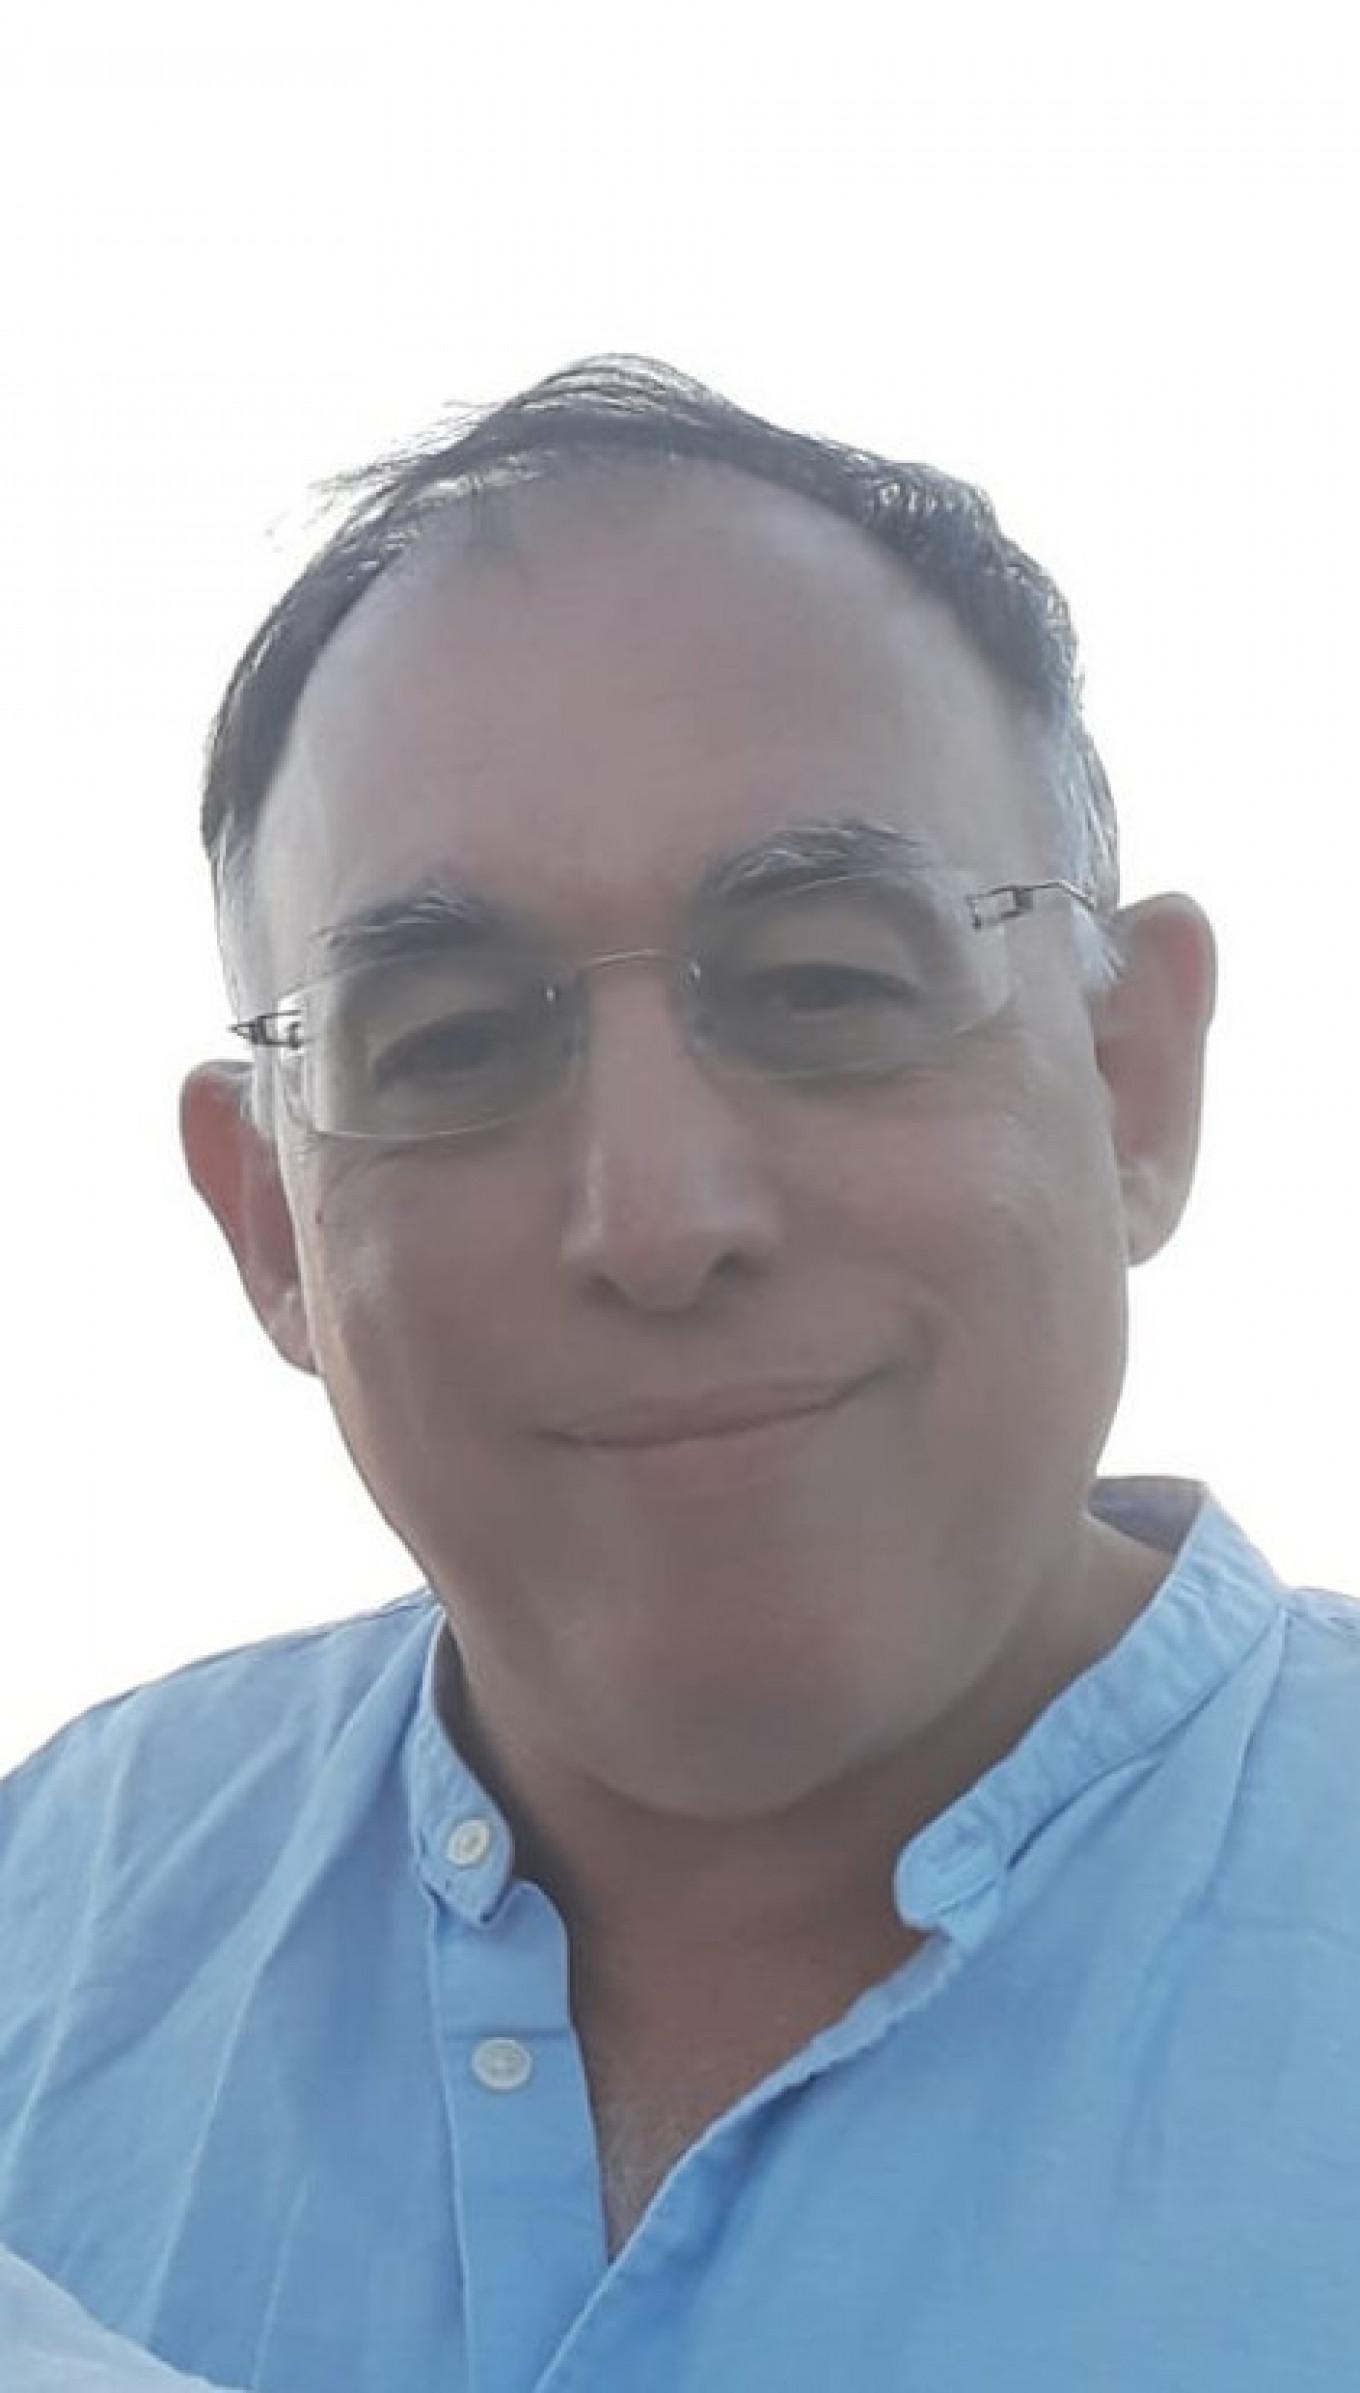 Author Eric Lee